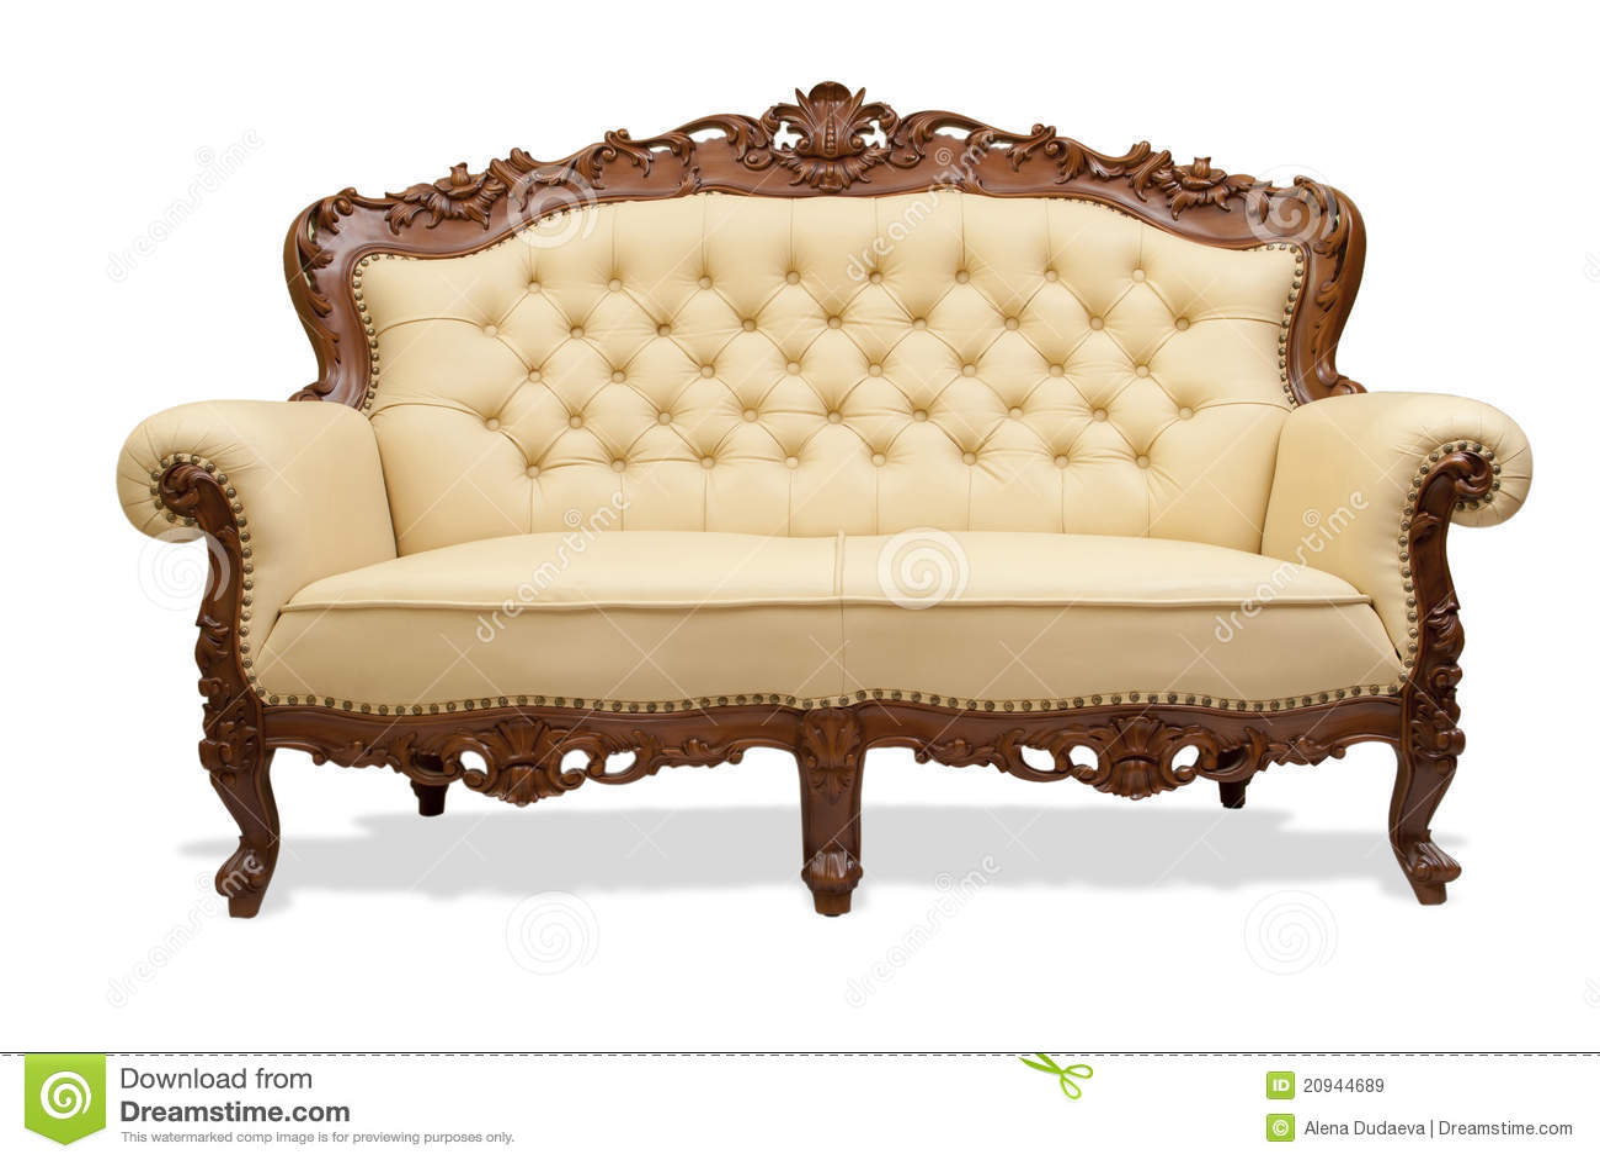 Silla de madera tallada cl sica for Muebles de sala tallados en madera